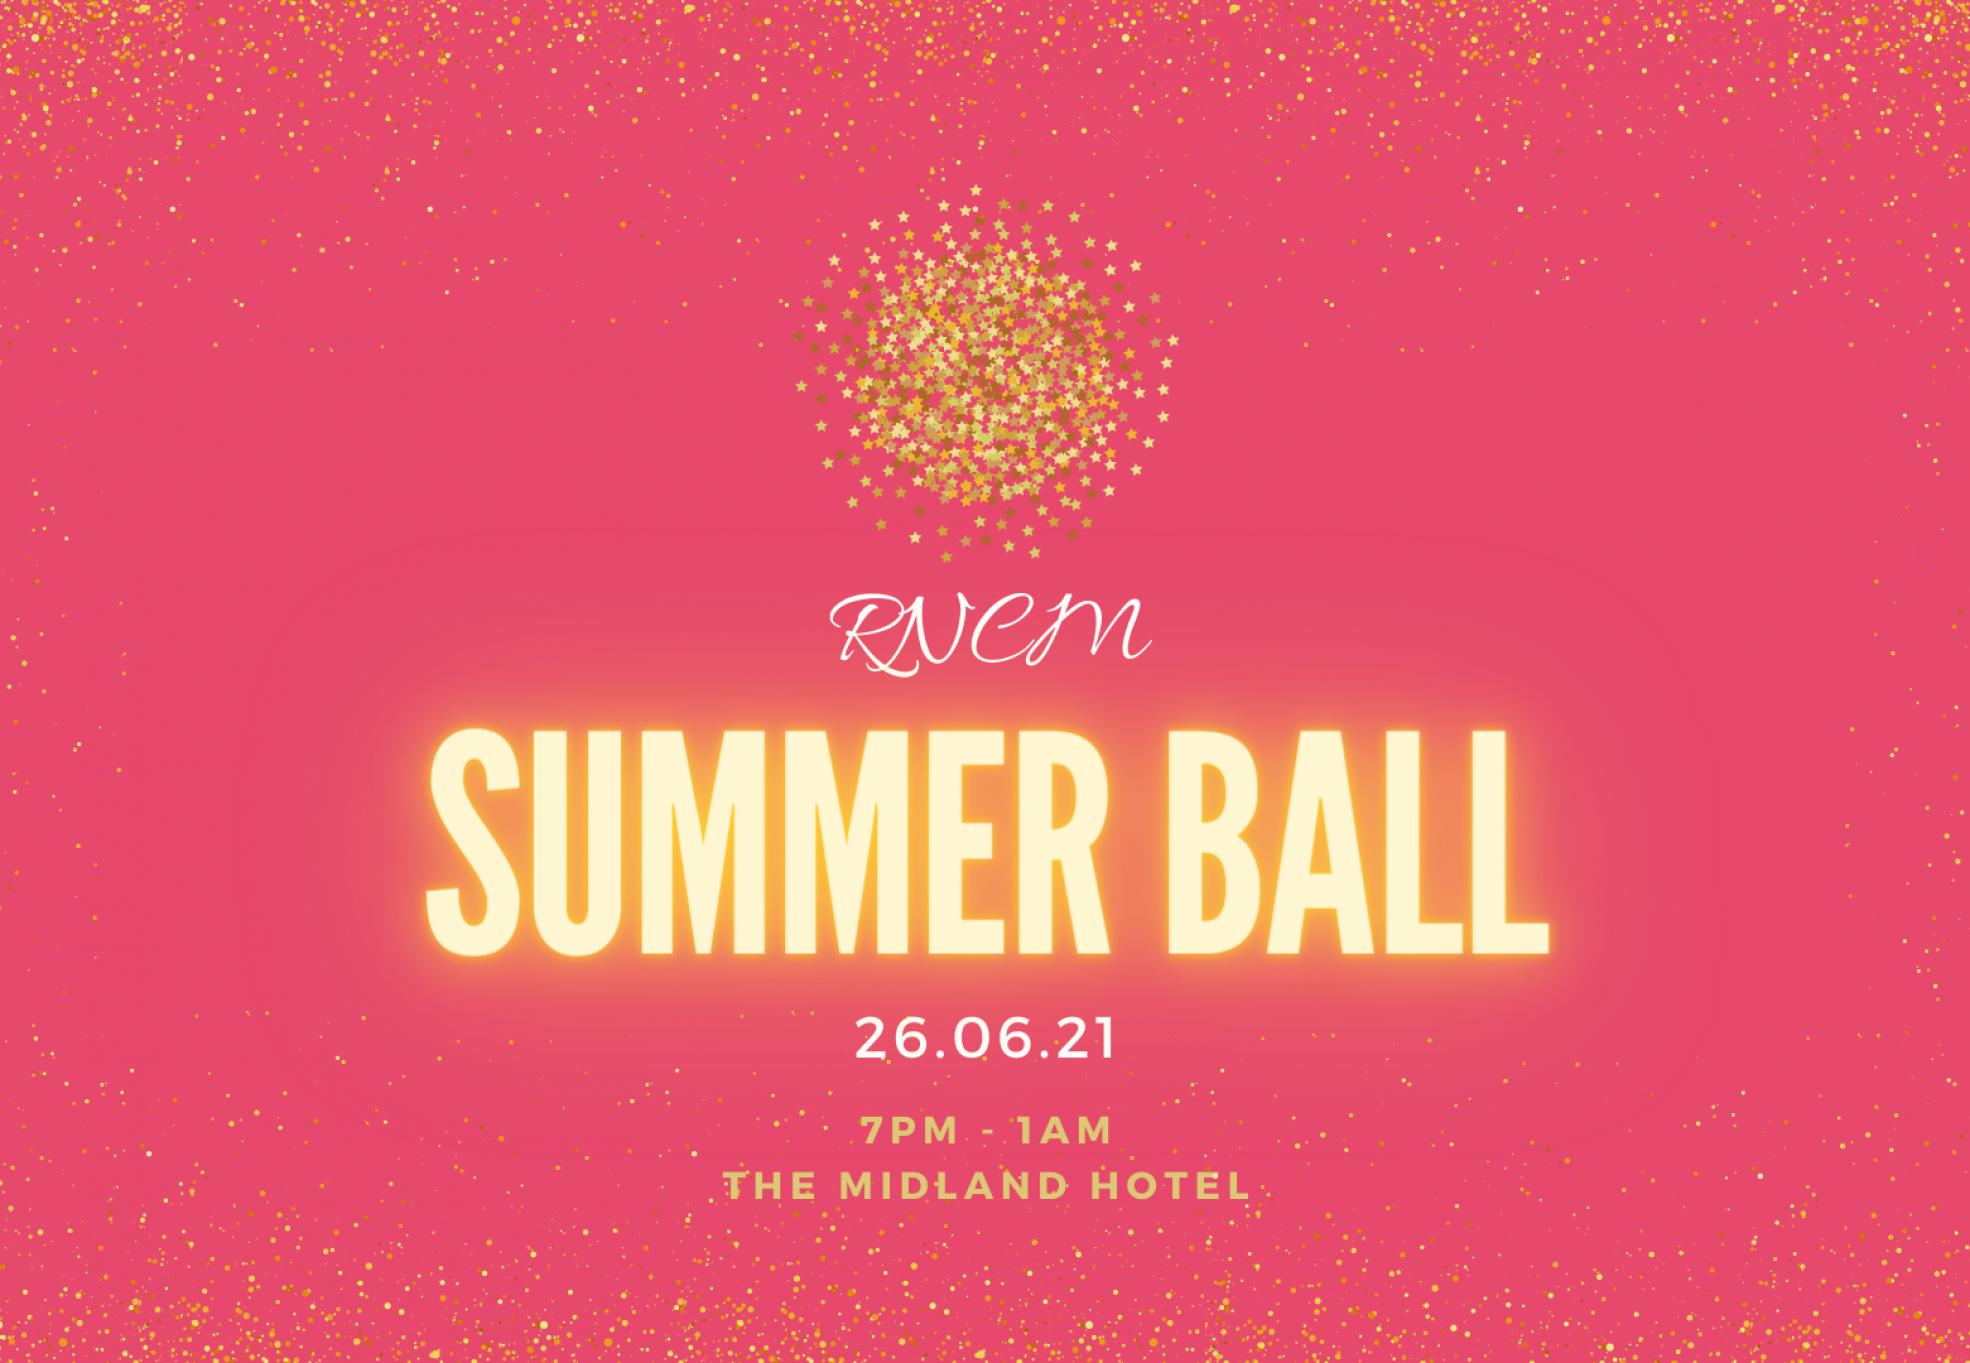 Copy of Summer ball instagram poster